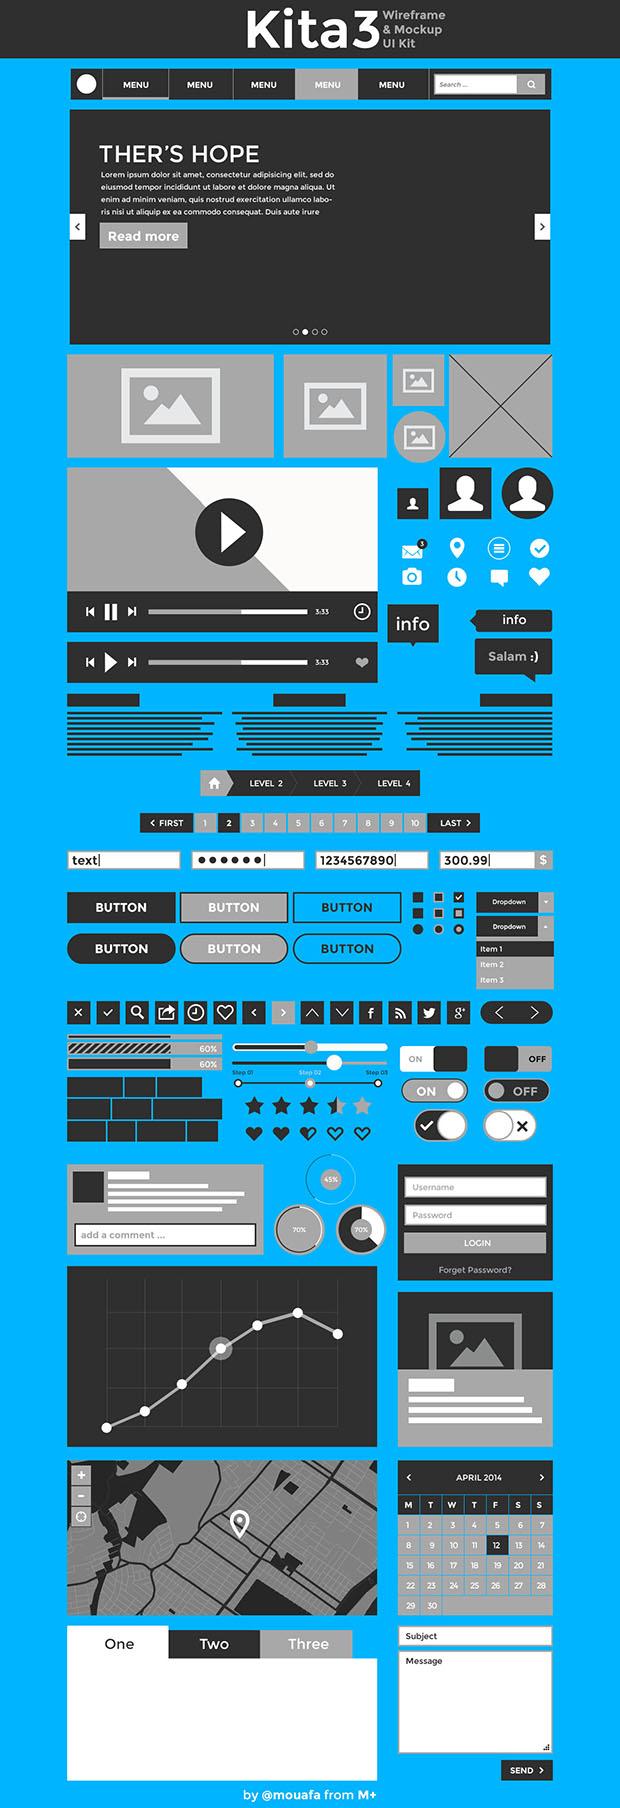 Kita3-Wireframe-&-Mockup-UI-kit